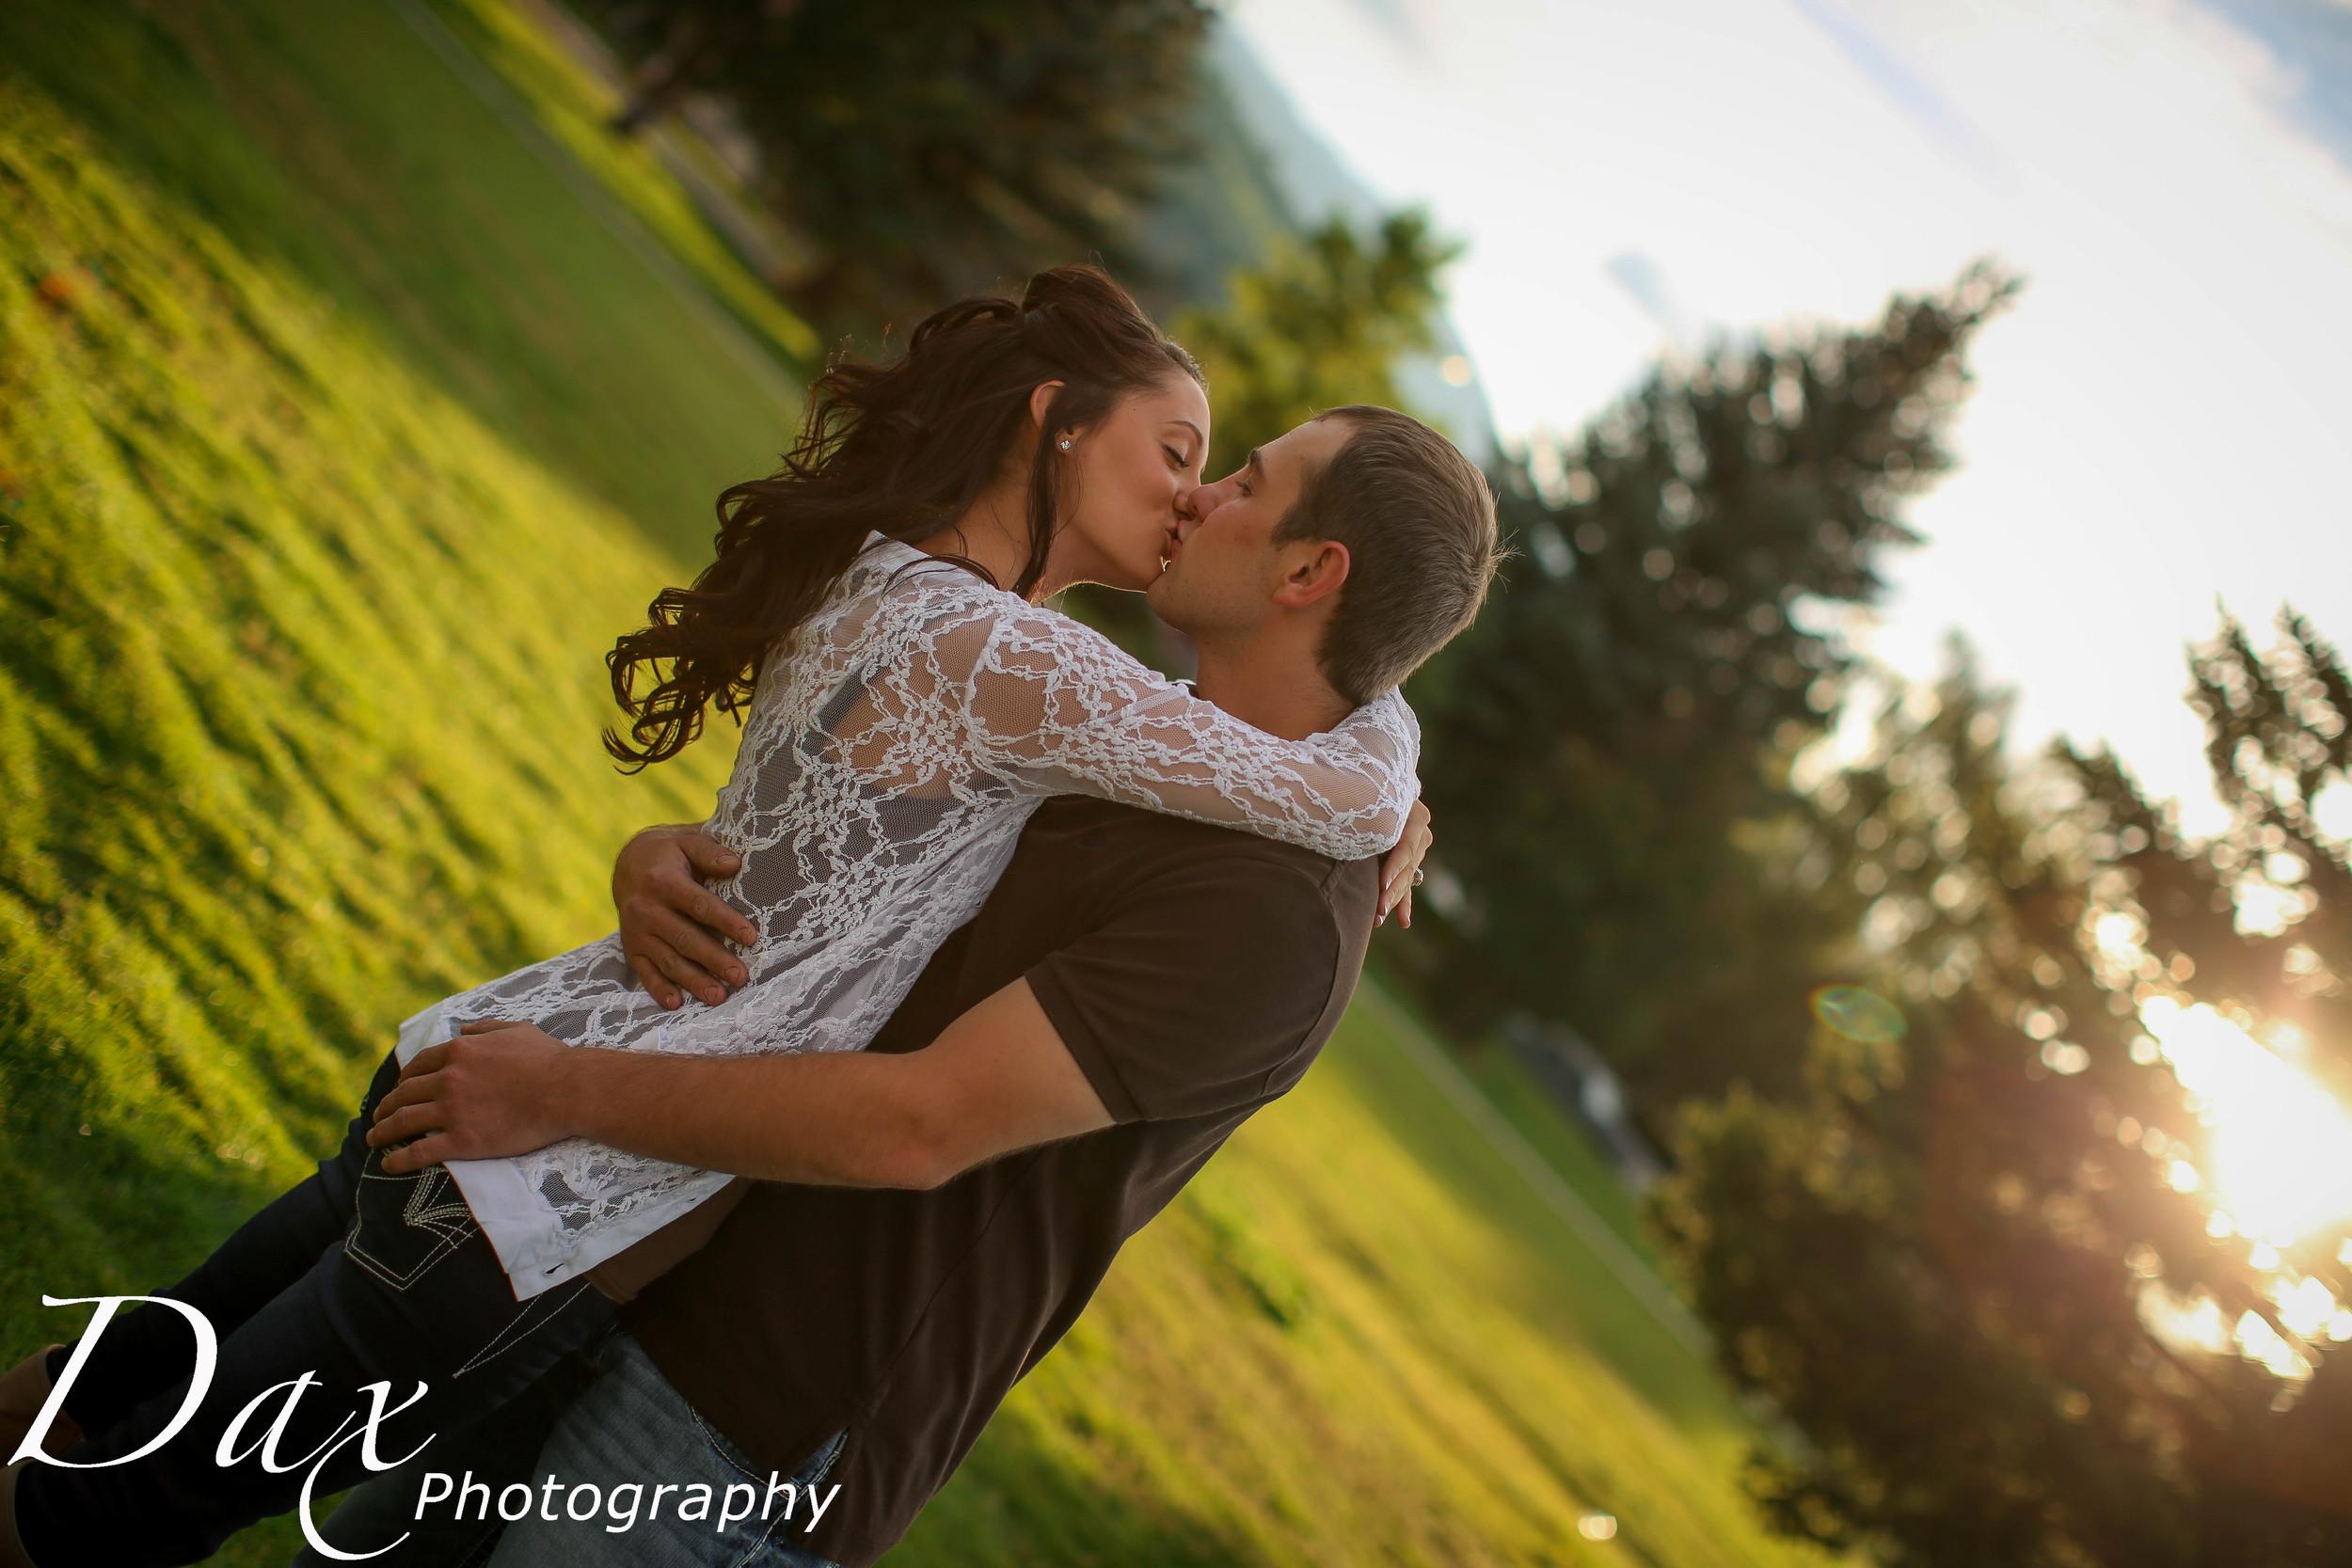 wpid-Montana-photographer-Engagement-Portrait-43771.jpg